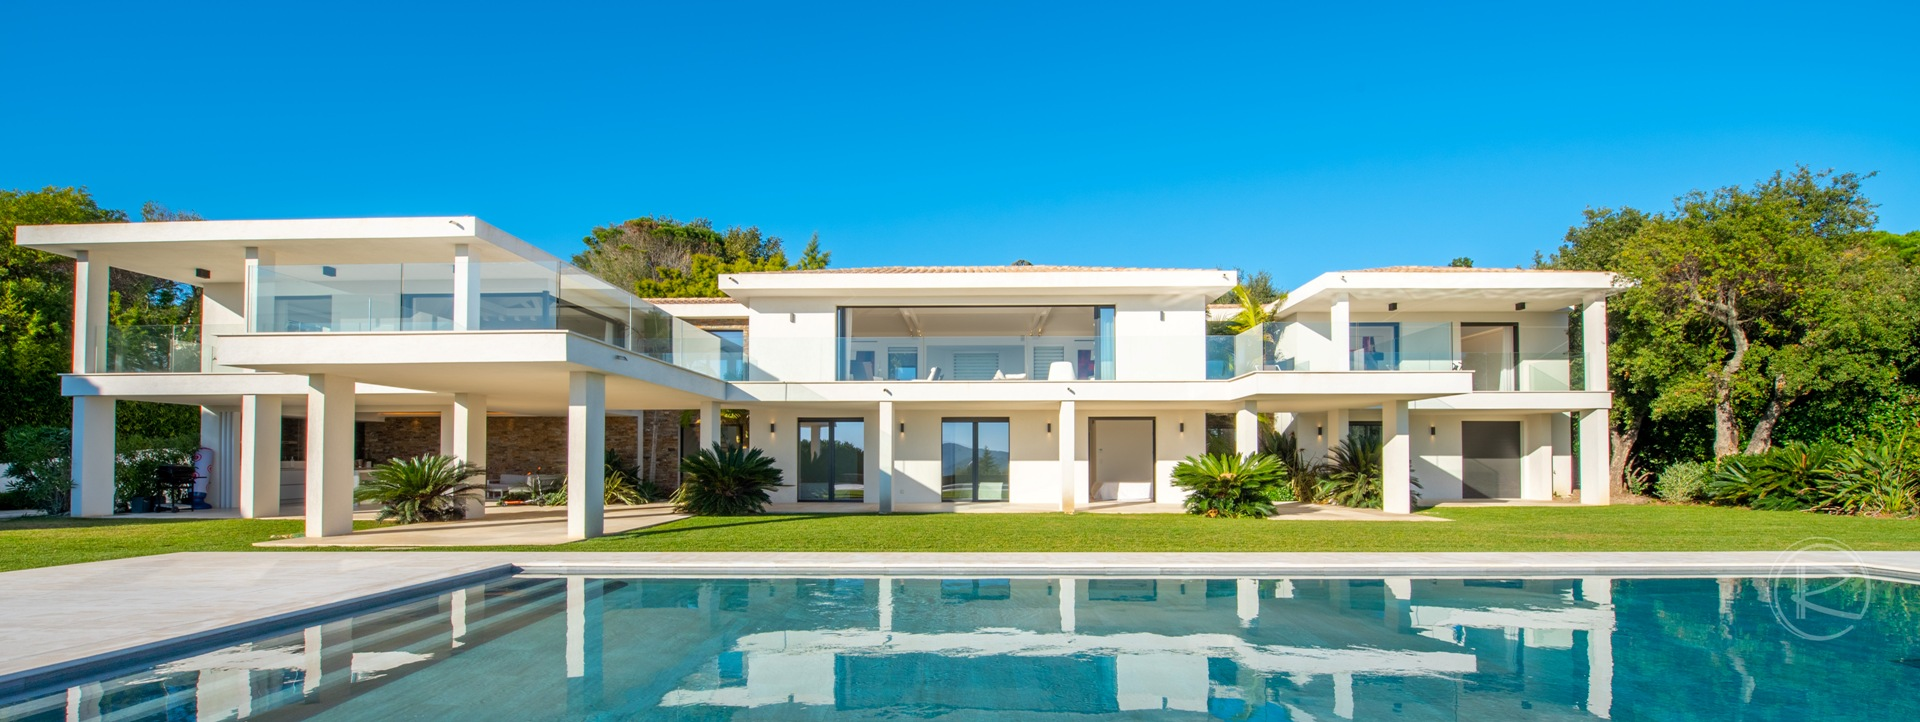 Beauvallon, Bay of Saint-Tropez, France property